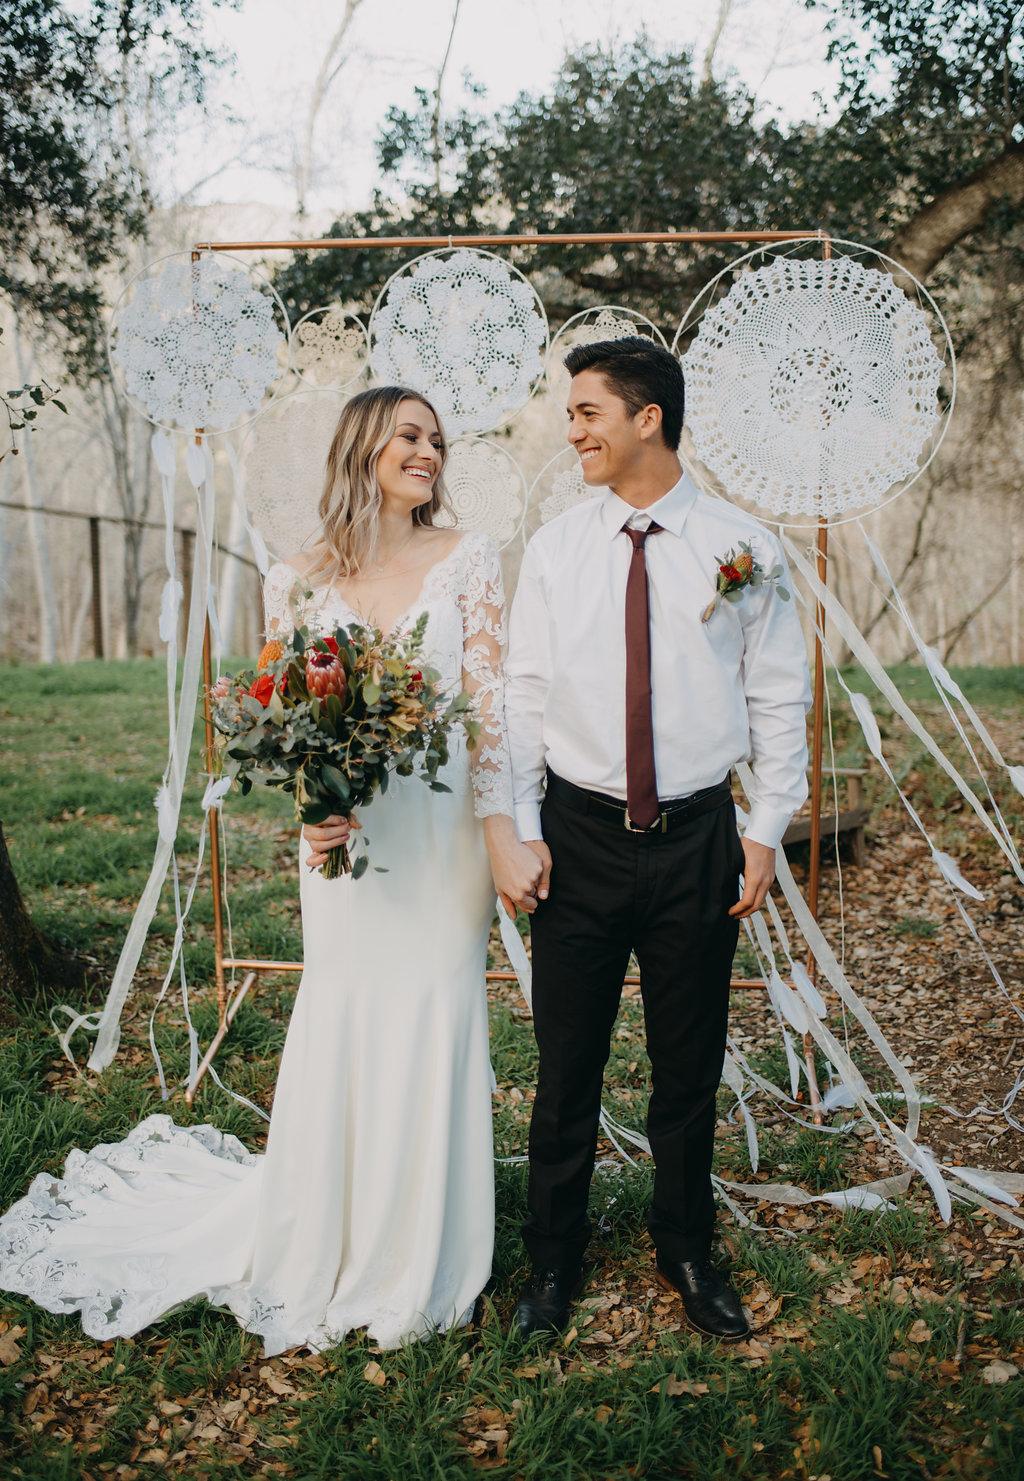 fun wedding photoshoot